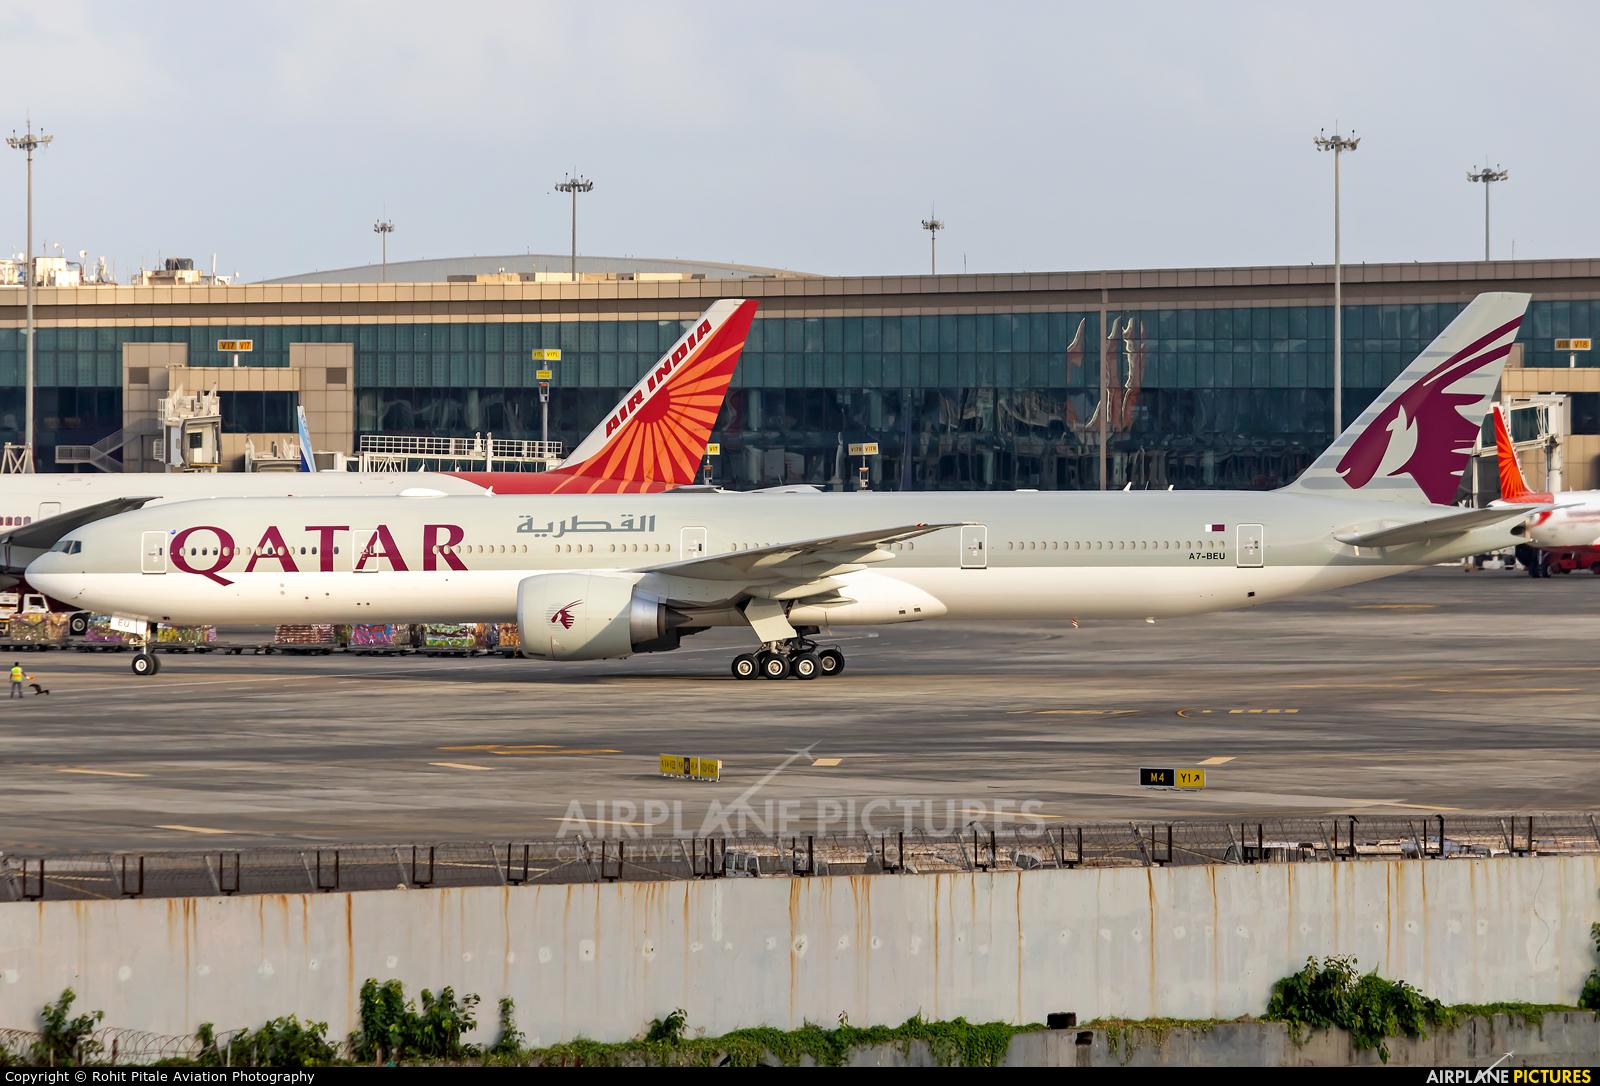 Qatar Airways A7-BEU aircraft at Mumbai - Chhatrapati Shivaji Intl